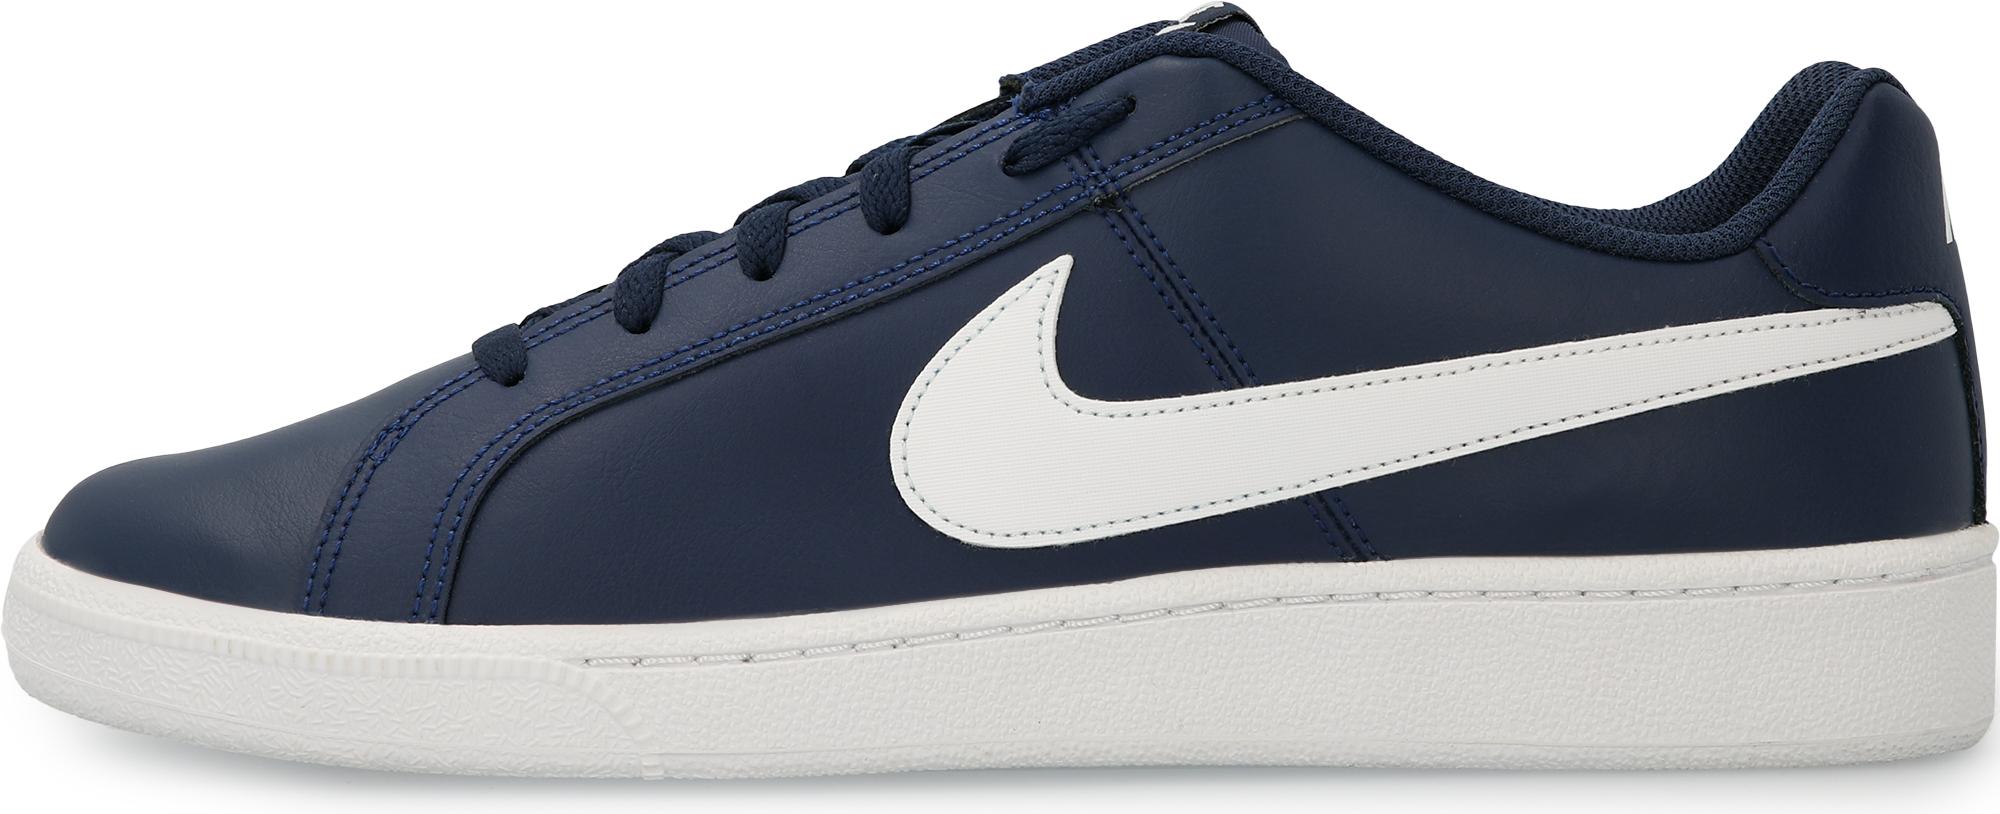 Nike Кеды мужские Nike Court Royale Shoe, размер 41 кроссовки nike cortez basic ltr se gs shoe girls aa3043 001